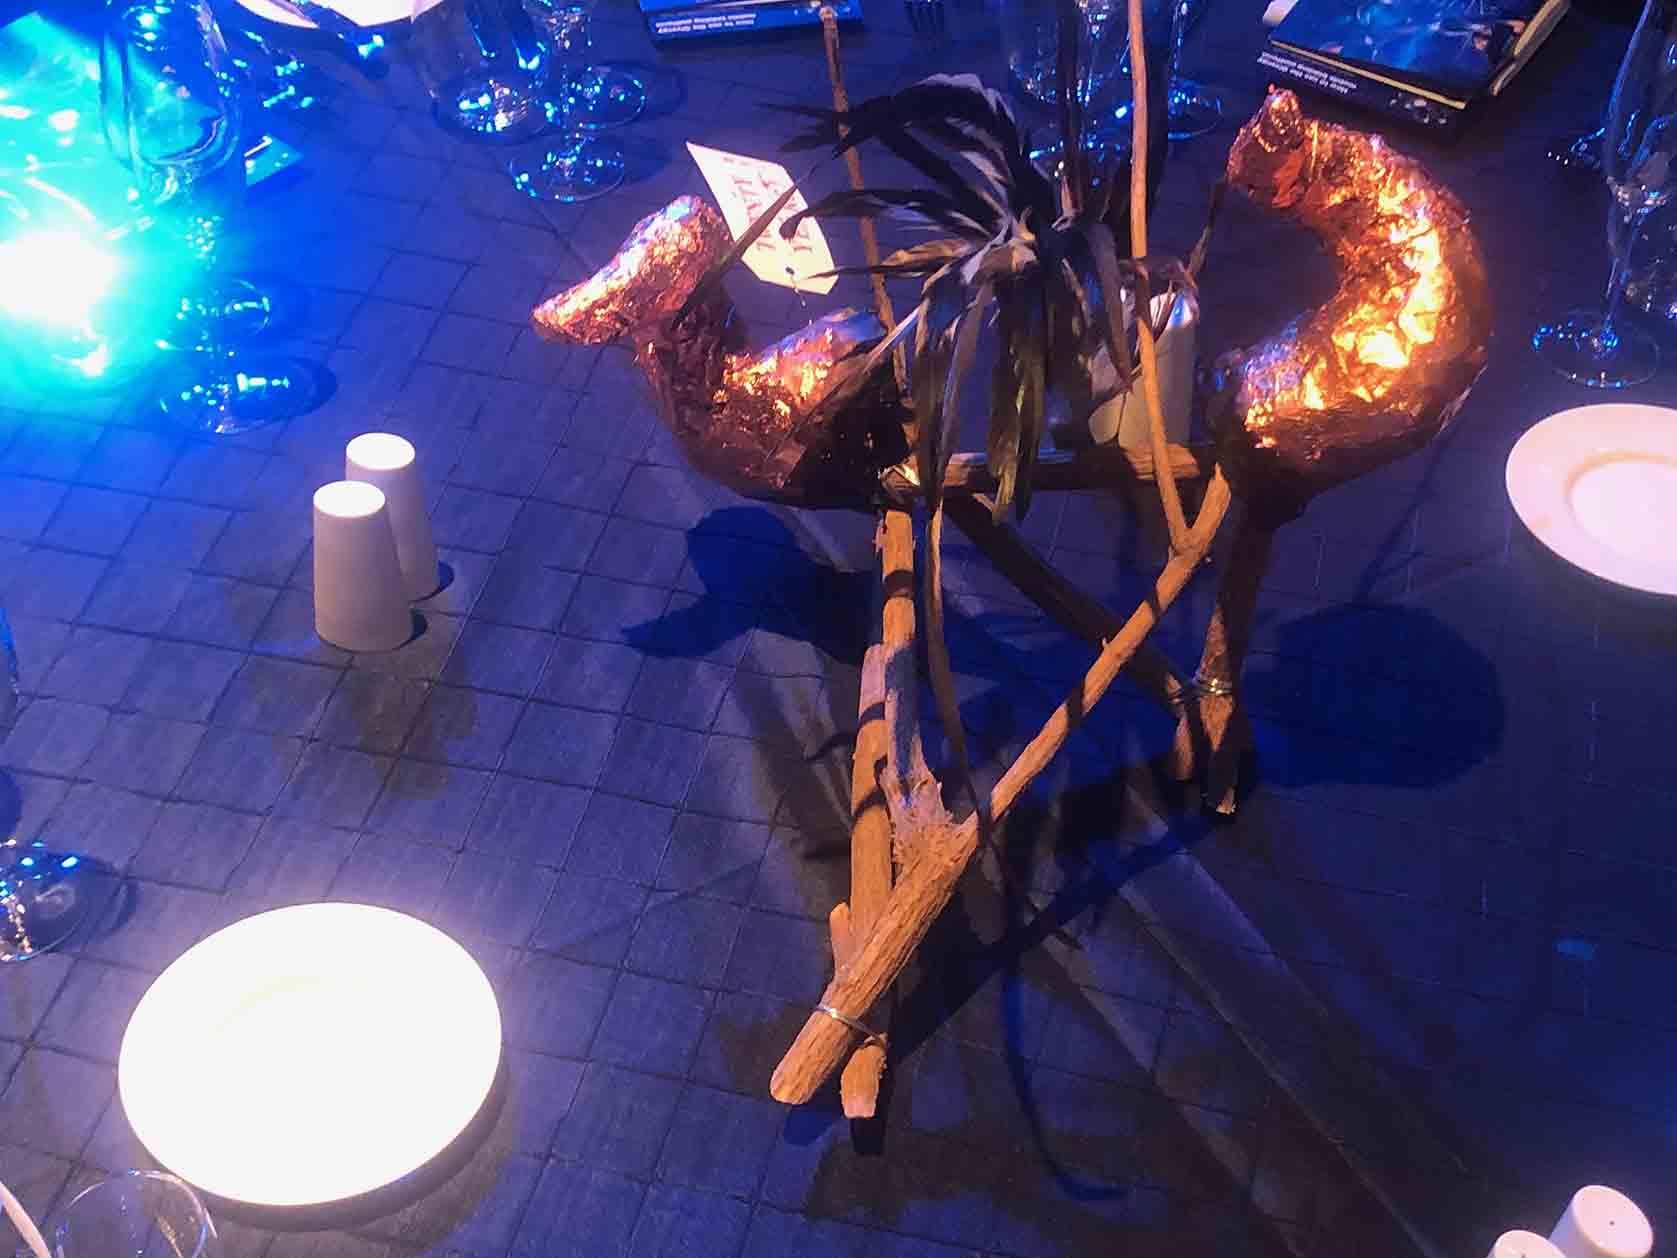 Copper Horned Beast on table